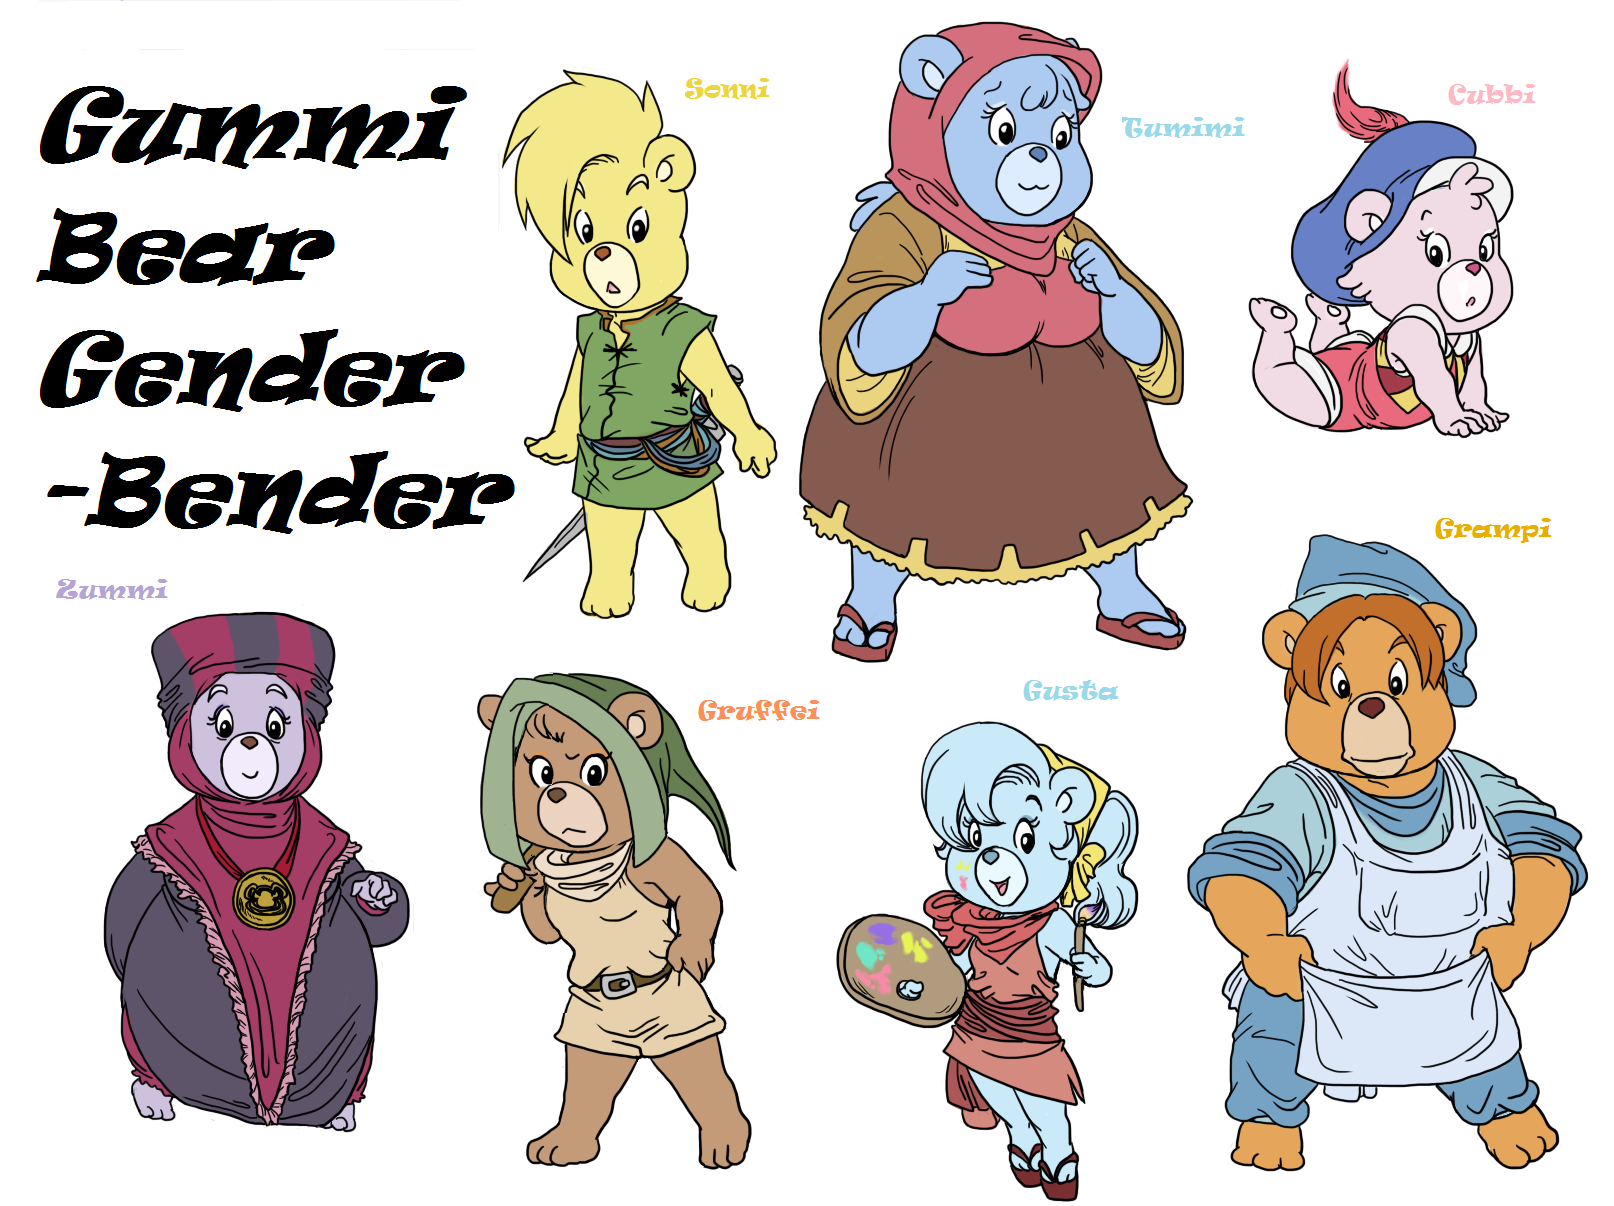 gummi bears gb by pritzpritz on deviantart rh deviantart com cute cartoon bear names cartoon teddy bear names